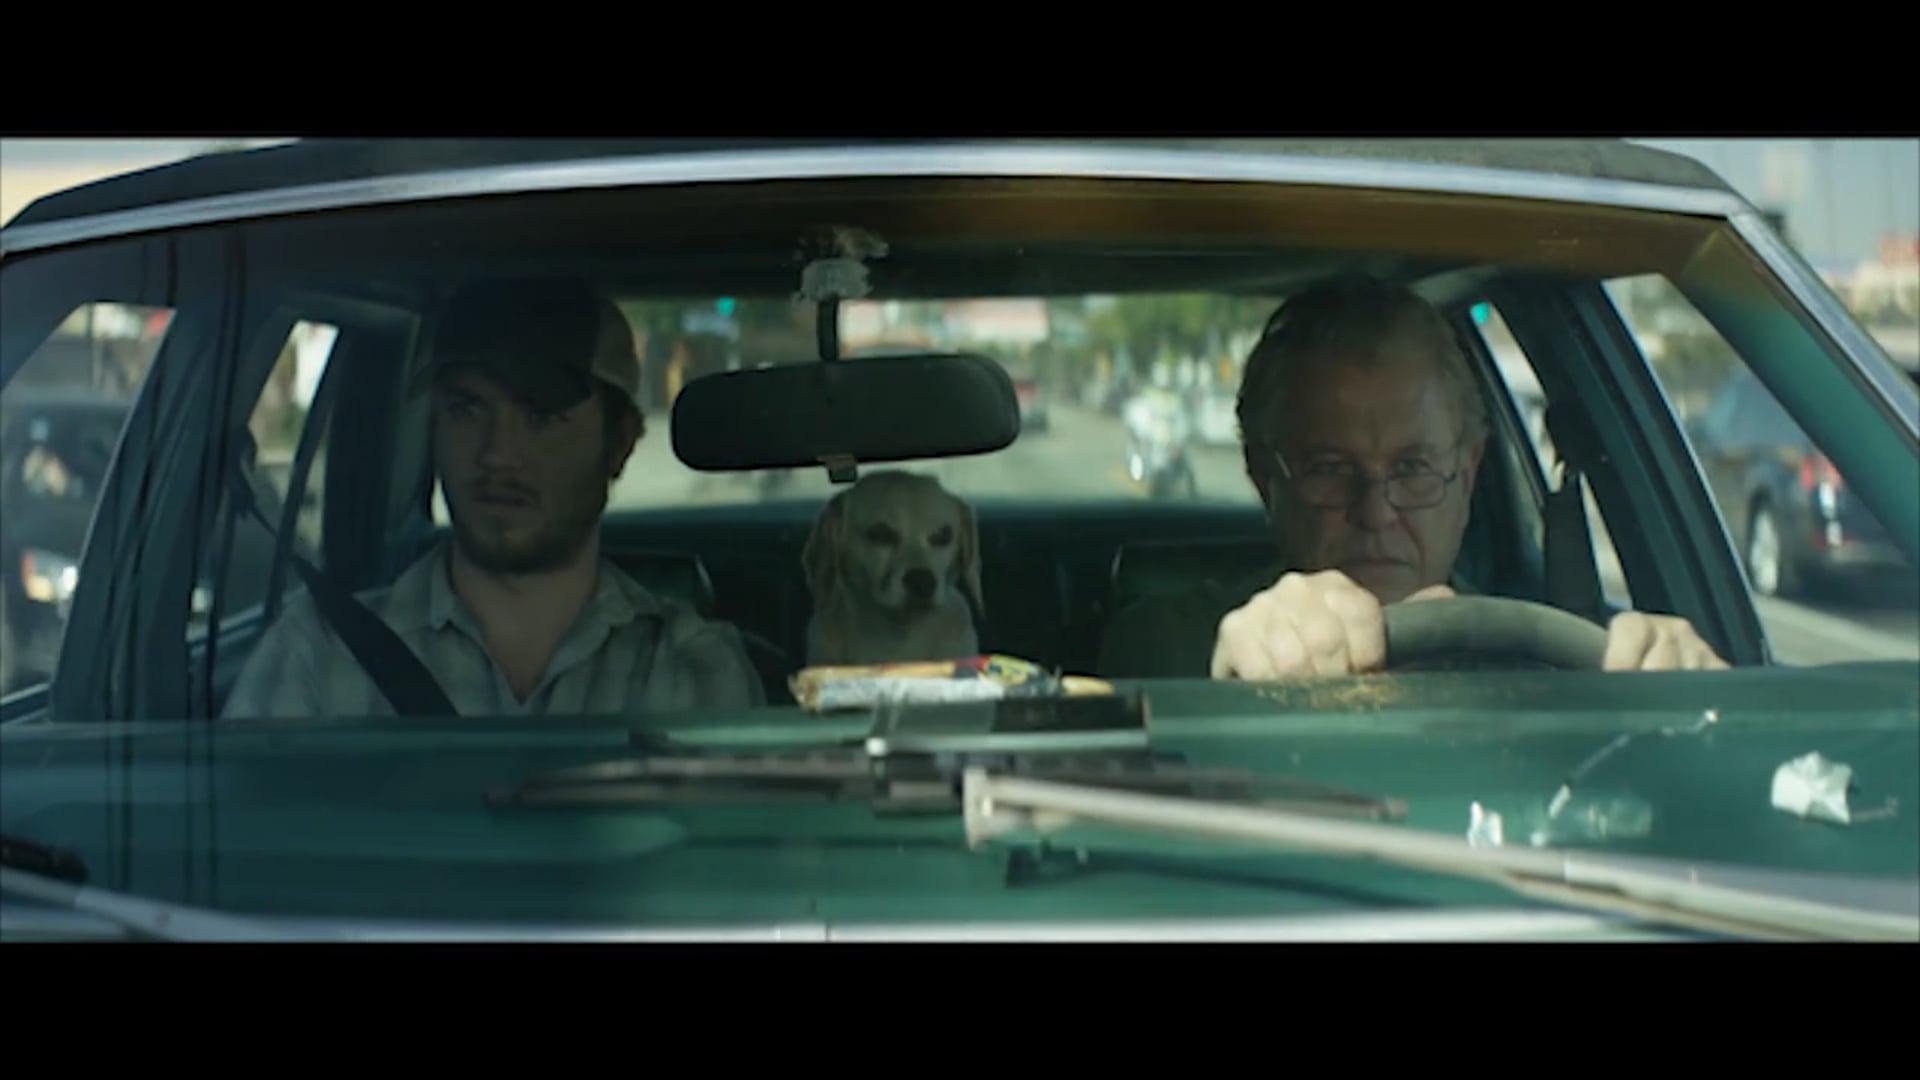 SARGASSO - Trailer